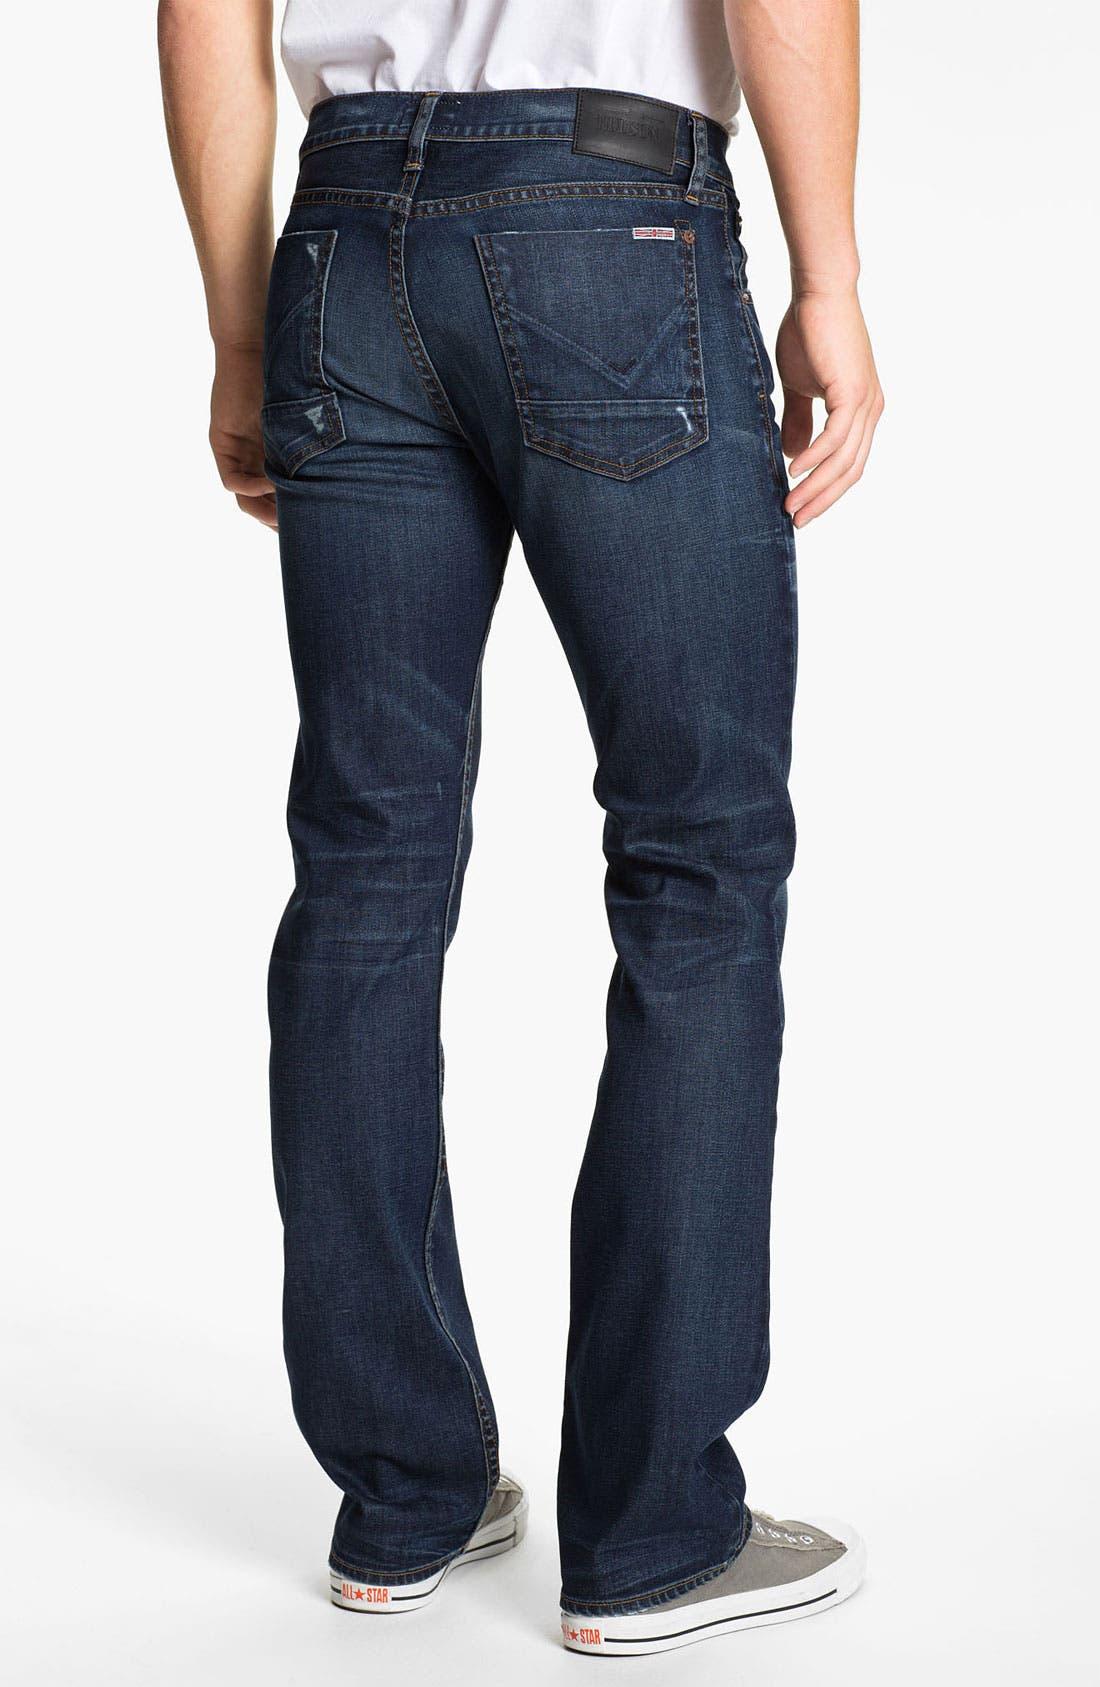 Main Image - Hudson Jeans 'Clifton' Bootcut Jeans (Revert)